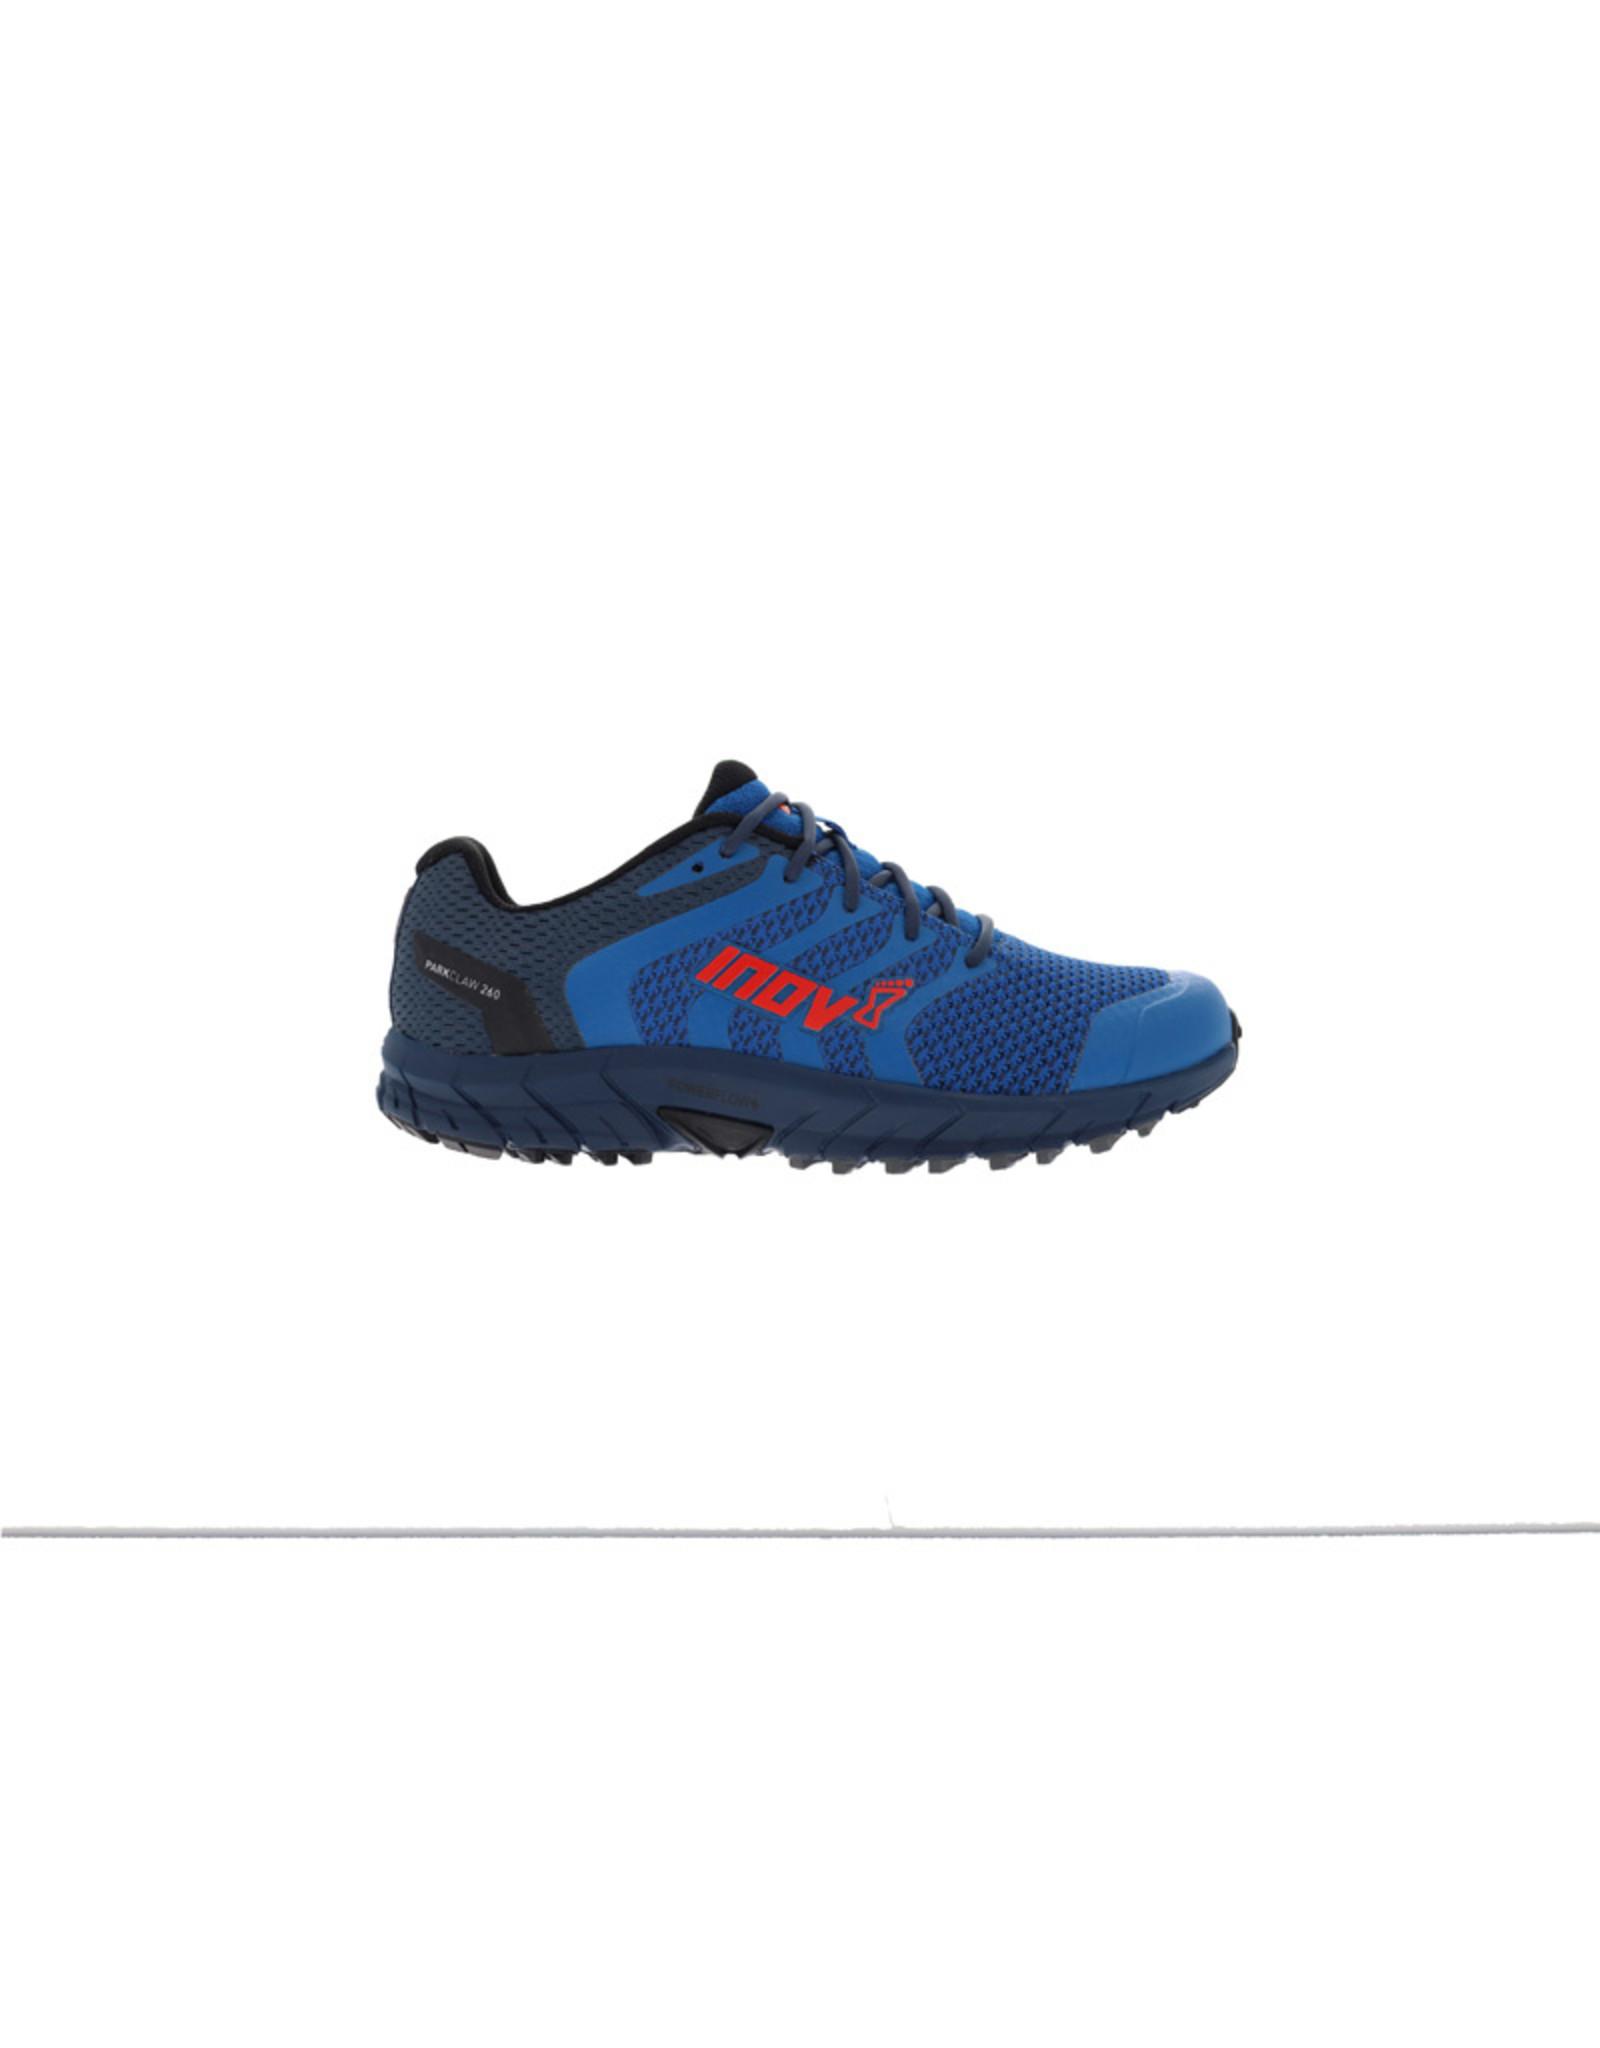 Inov-8 Parkclaw 260 Knit Chaussure Trailrun - Bleu/Rouge